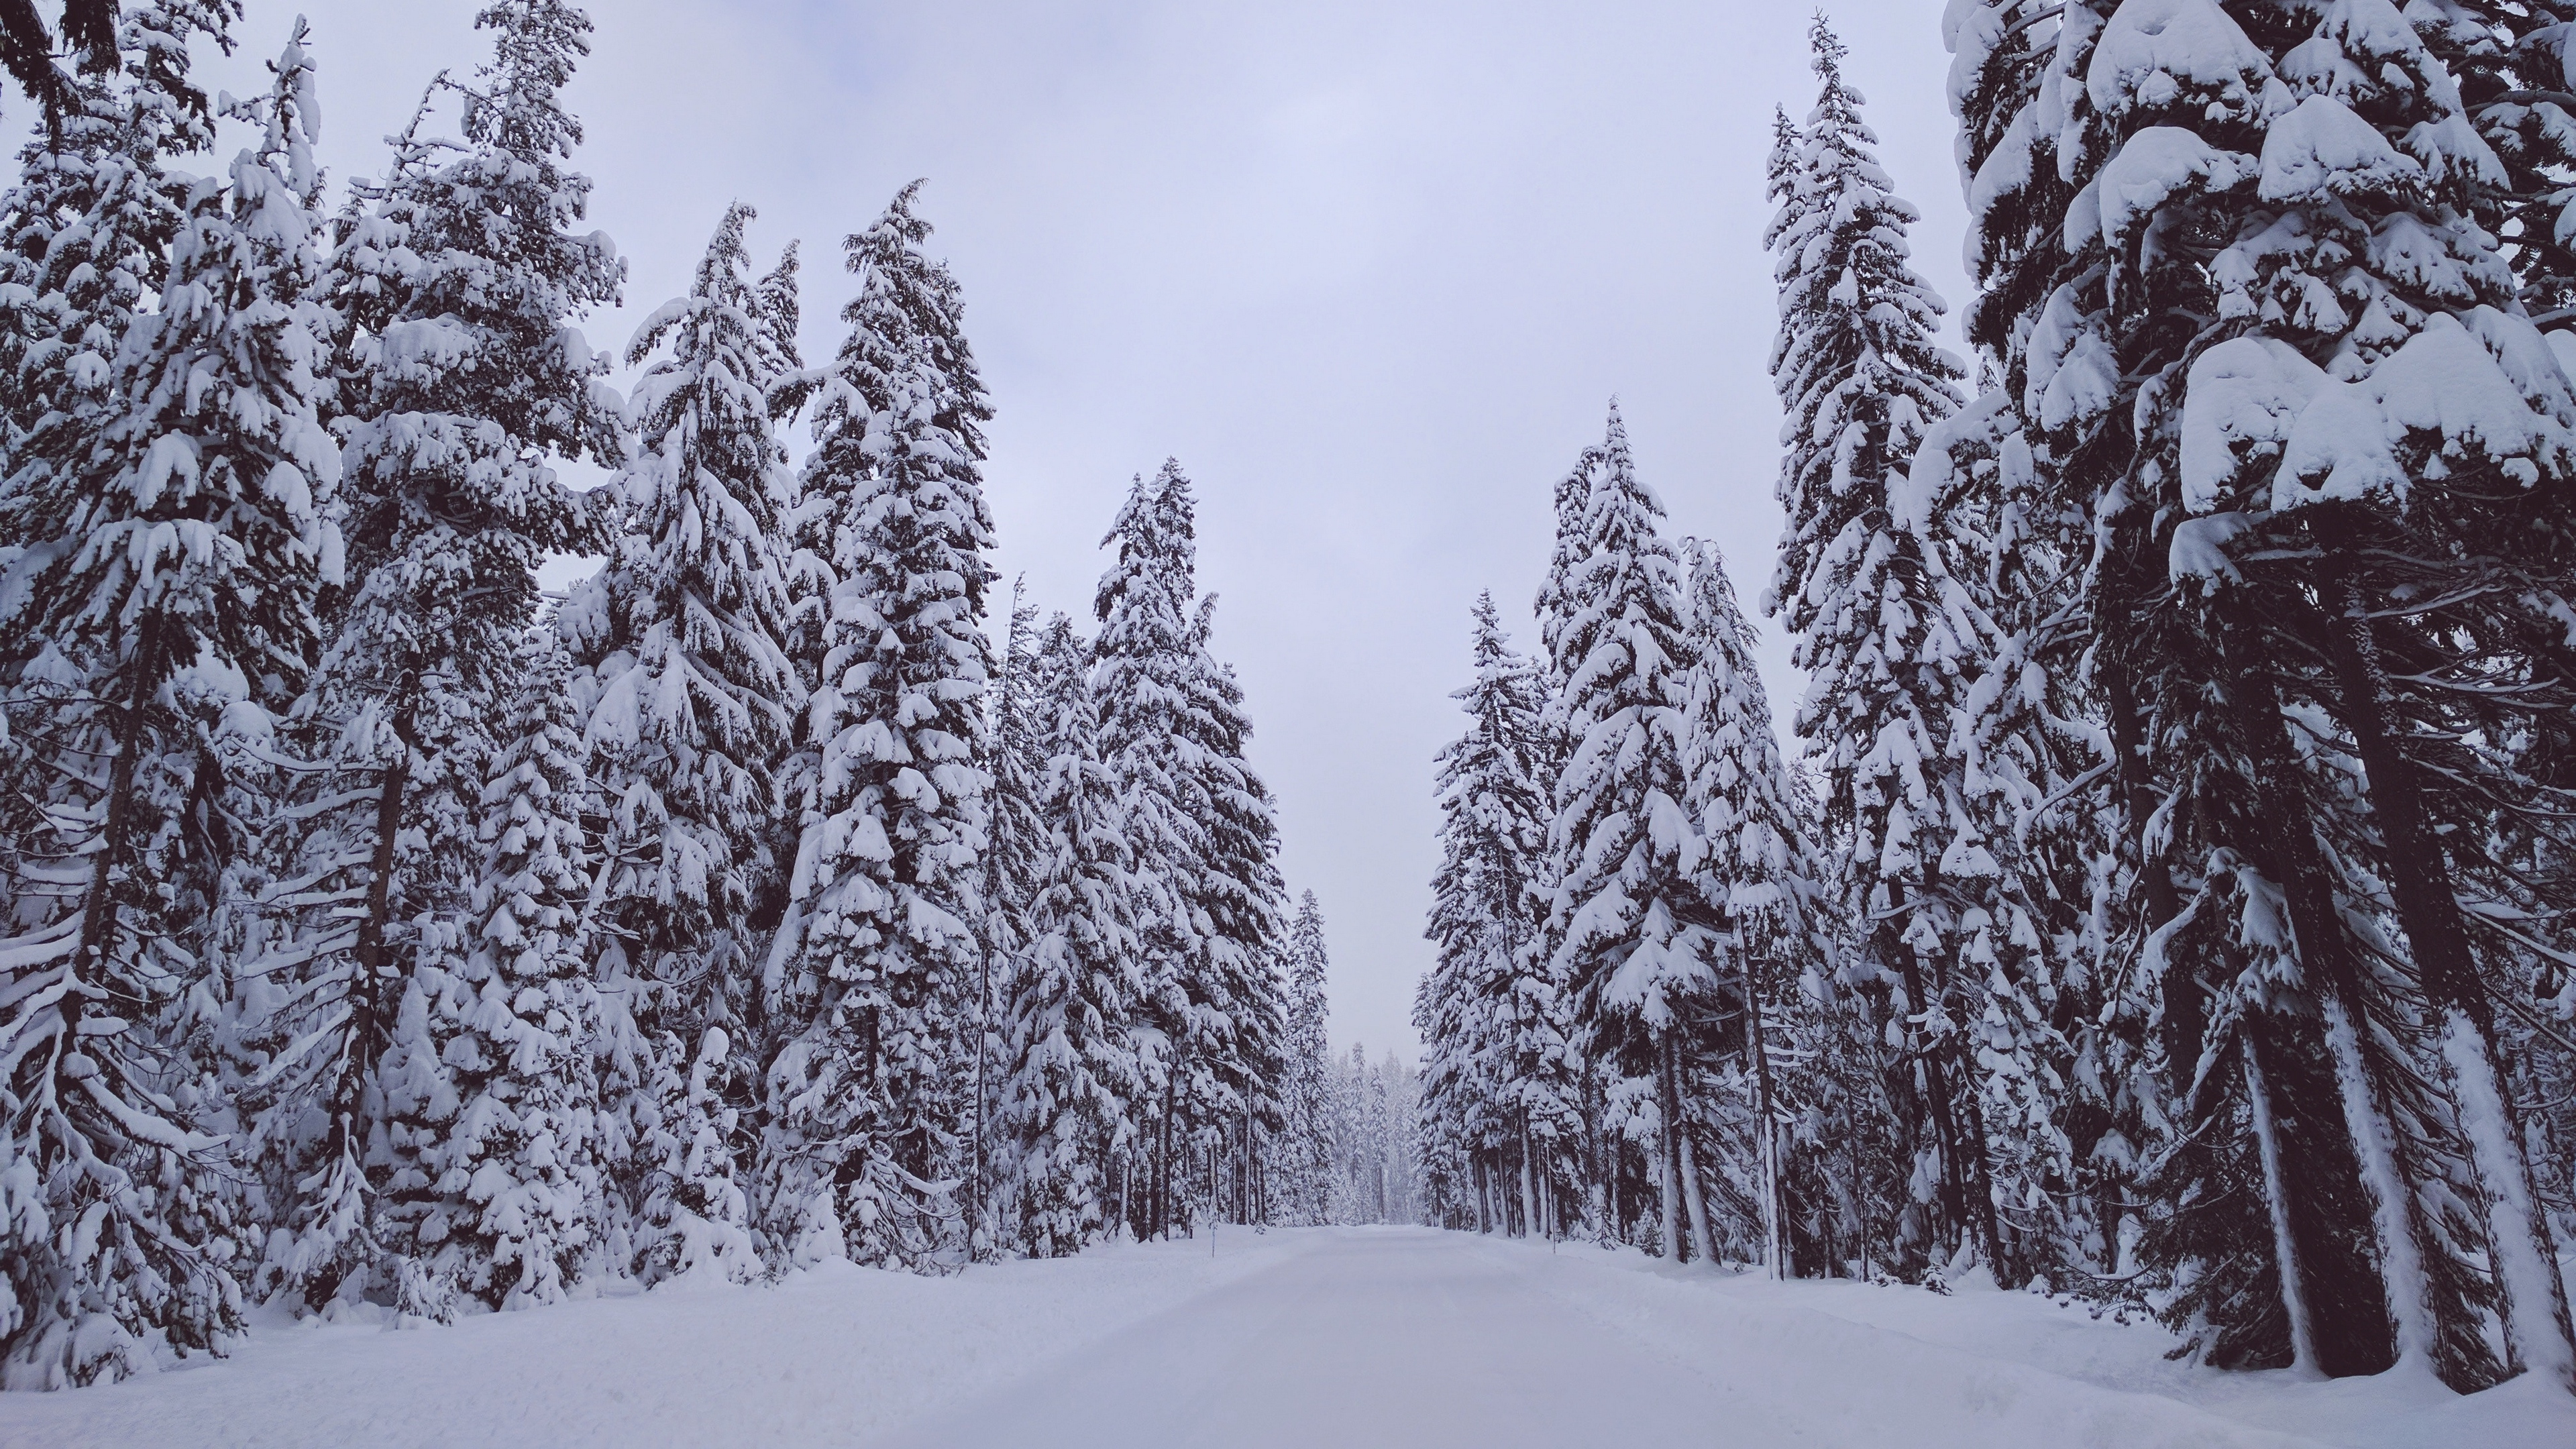 trees snow winter 4k 1541116624 - trees, snow, winter 4k - Winter, Trees, Snow